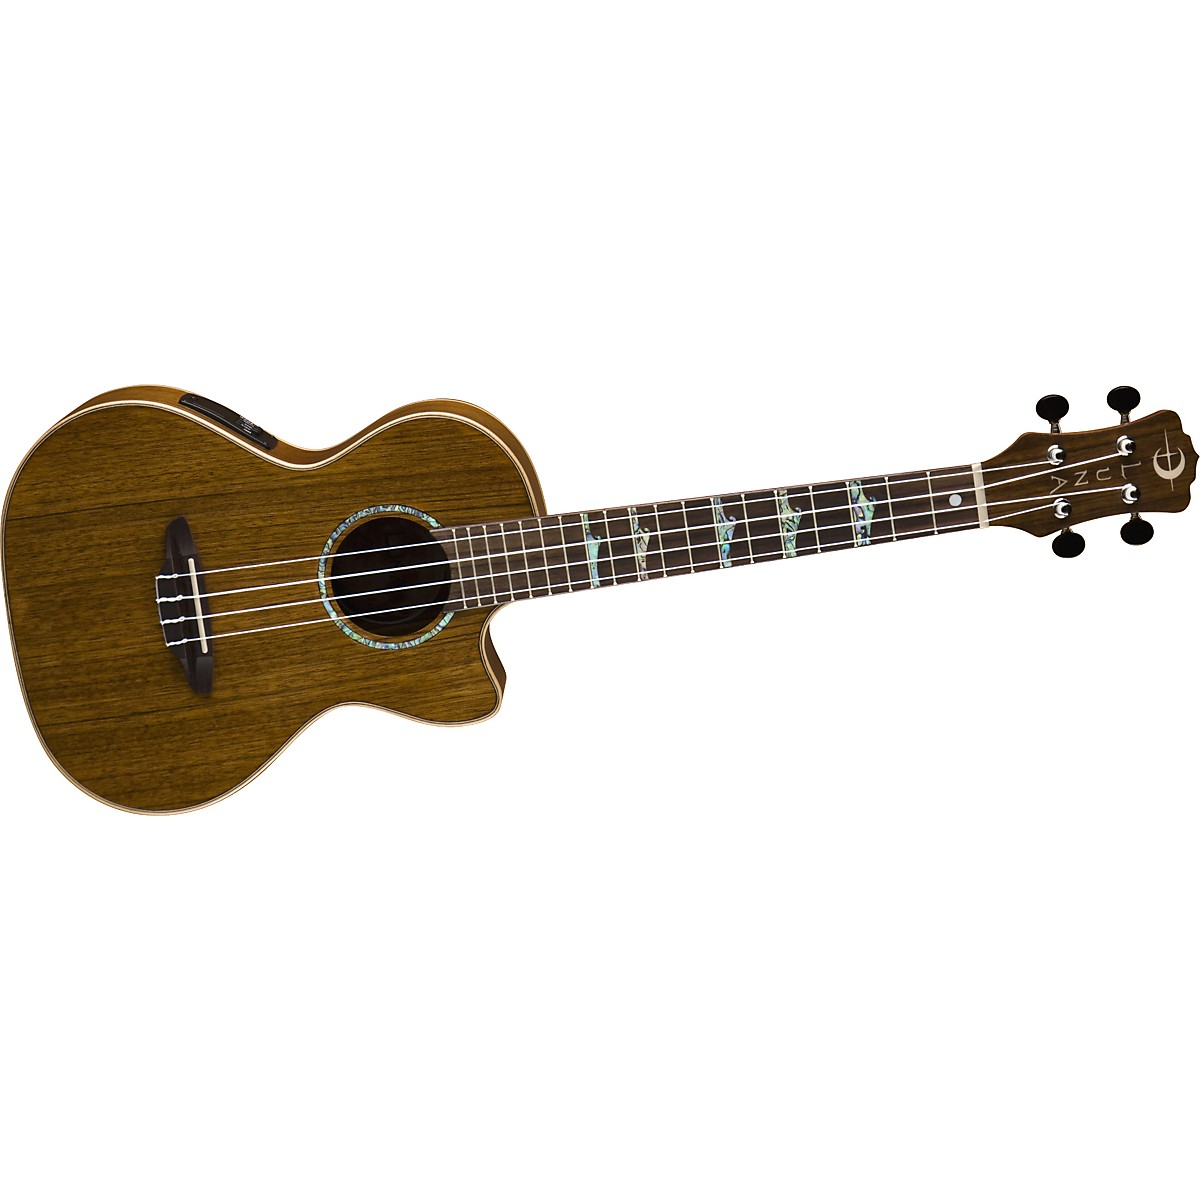 Luna Guitars High-Tide Ovangkol Tenor Ukulele